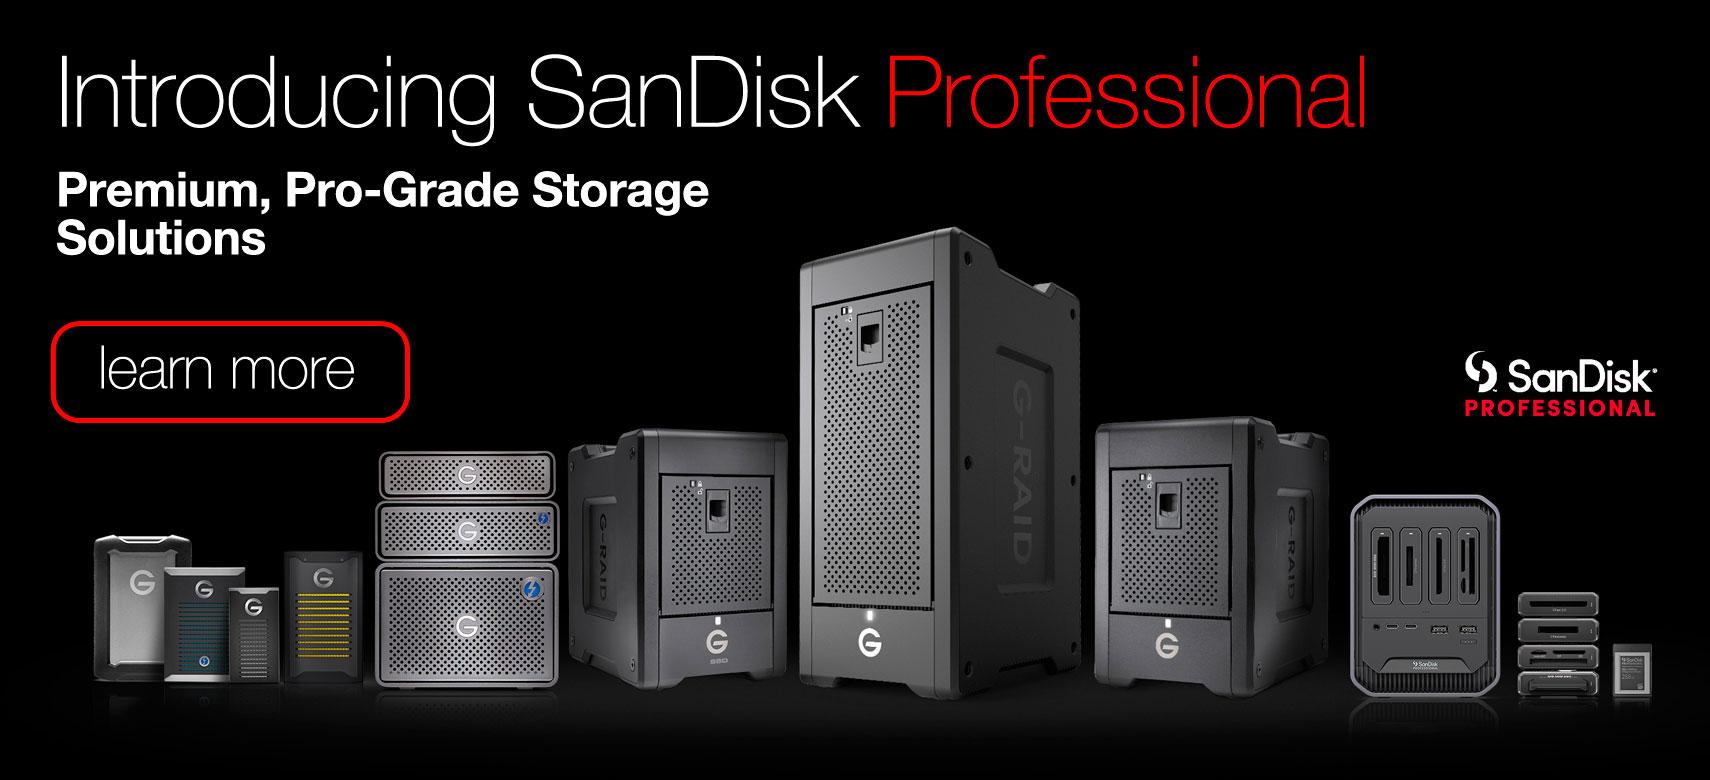 SanDisk Professional